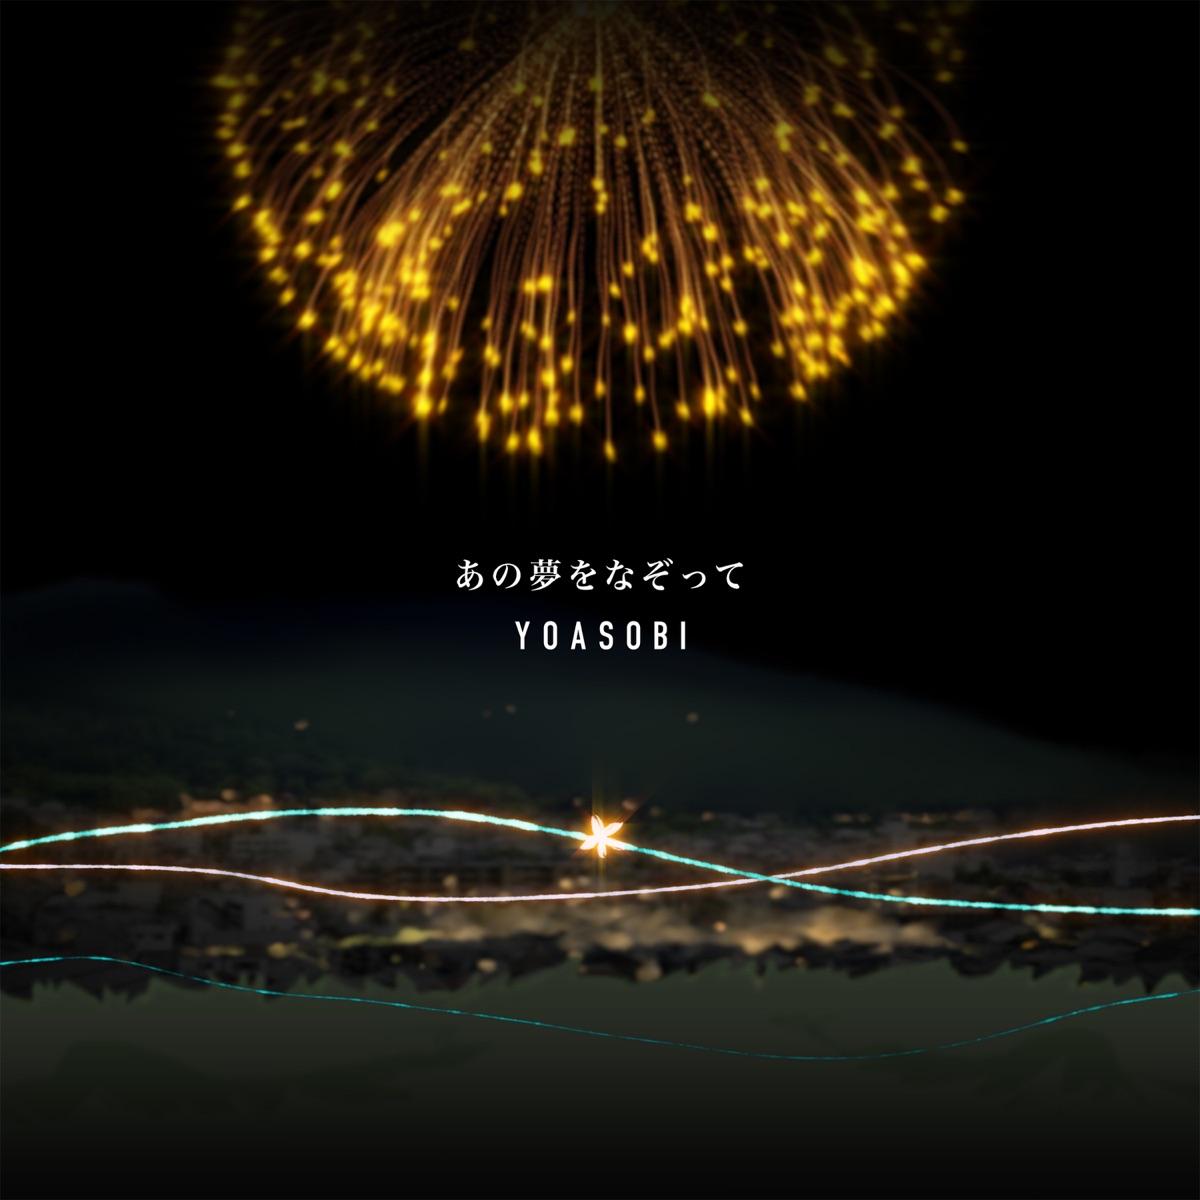 『YOASOBI - あの夢をなぞって』収録の『あの夢をなぞって』ジャケット